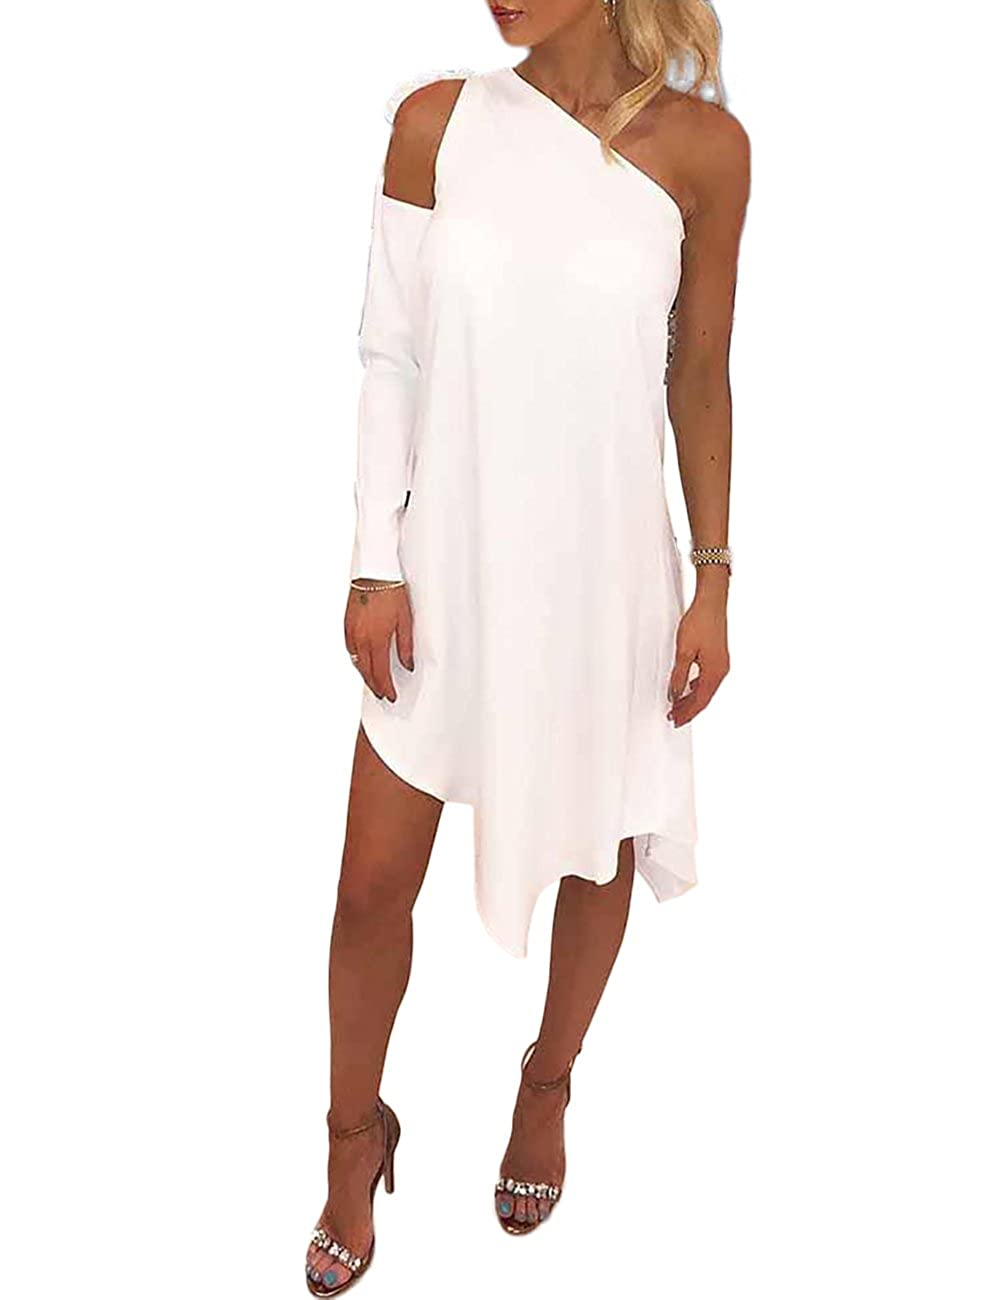 248256f2622 Online Cheap wholesale Ninimour Women Cutout One Sleeve Irregular Hem  Casual Dress Dresses Suppliers